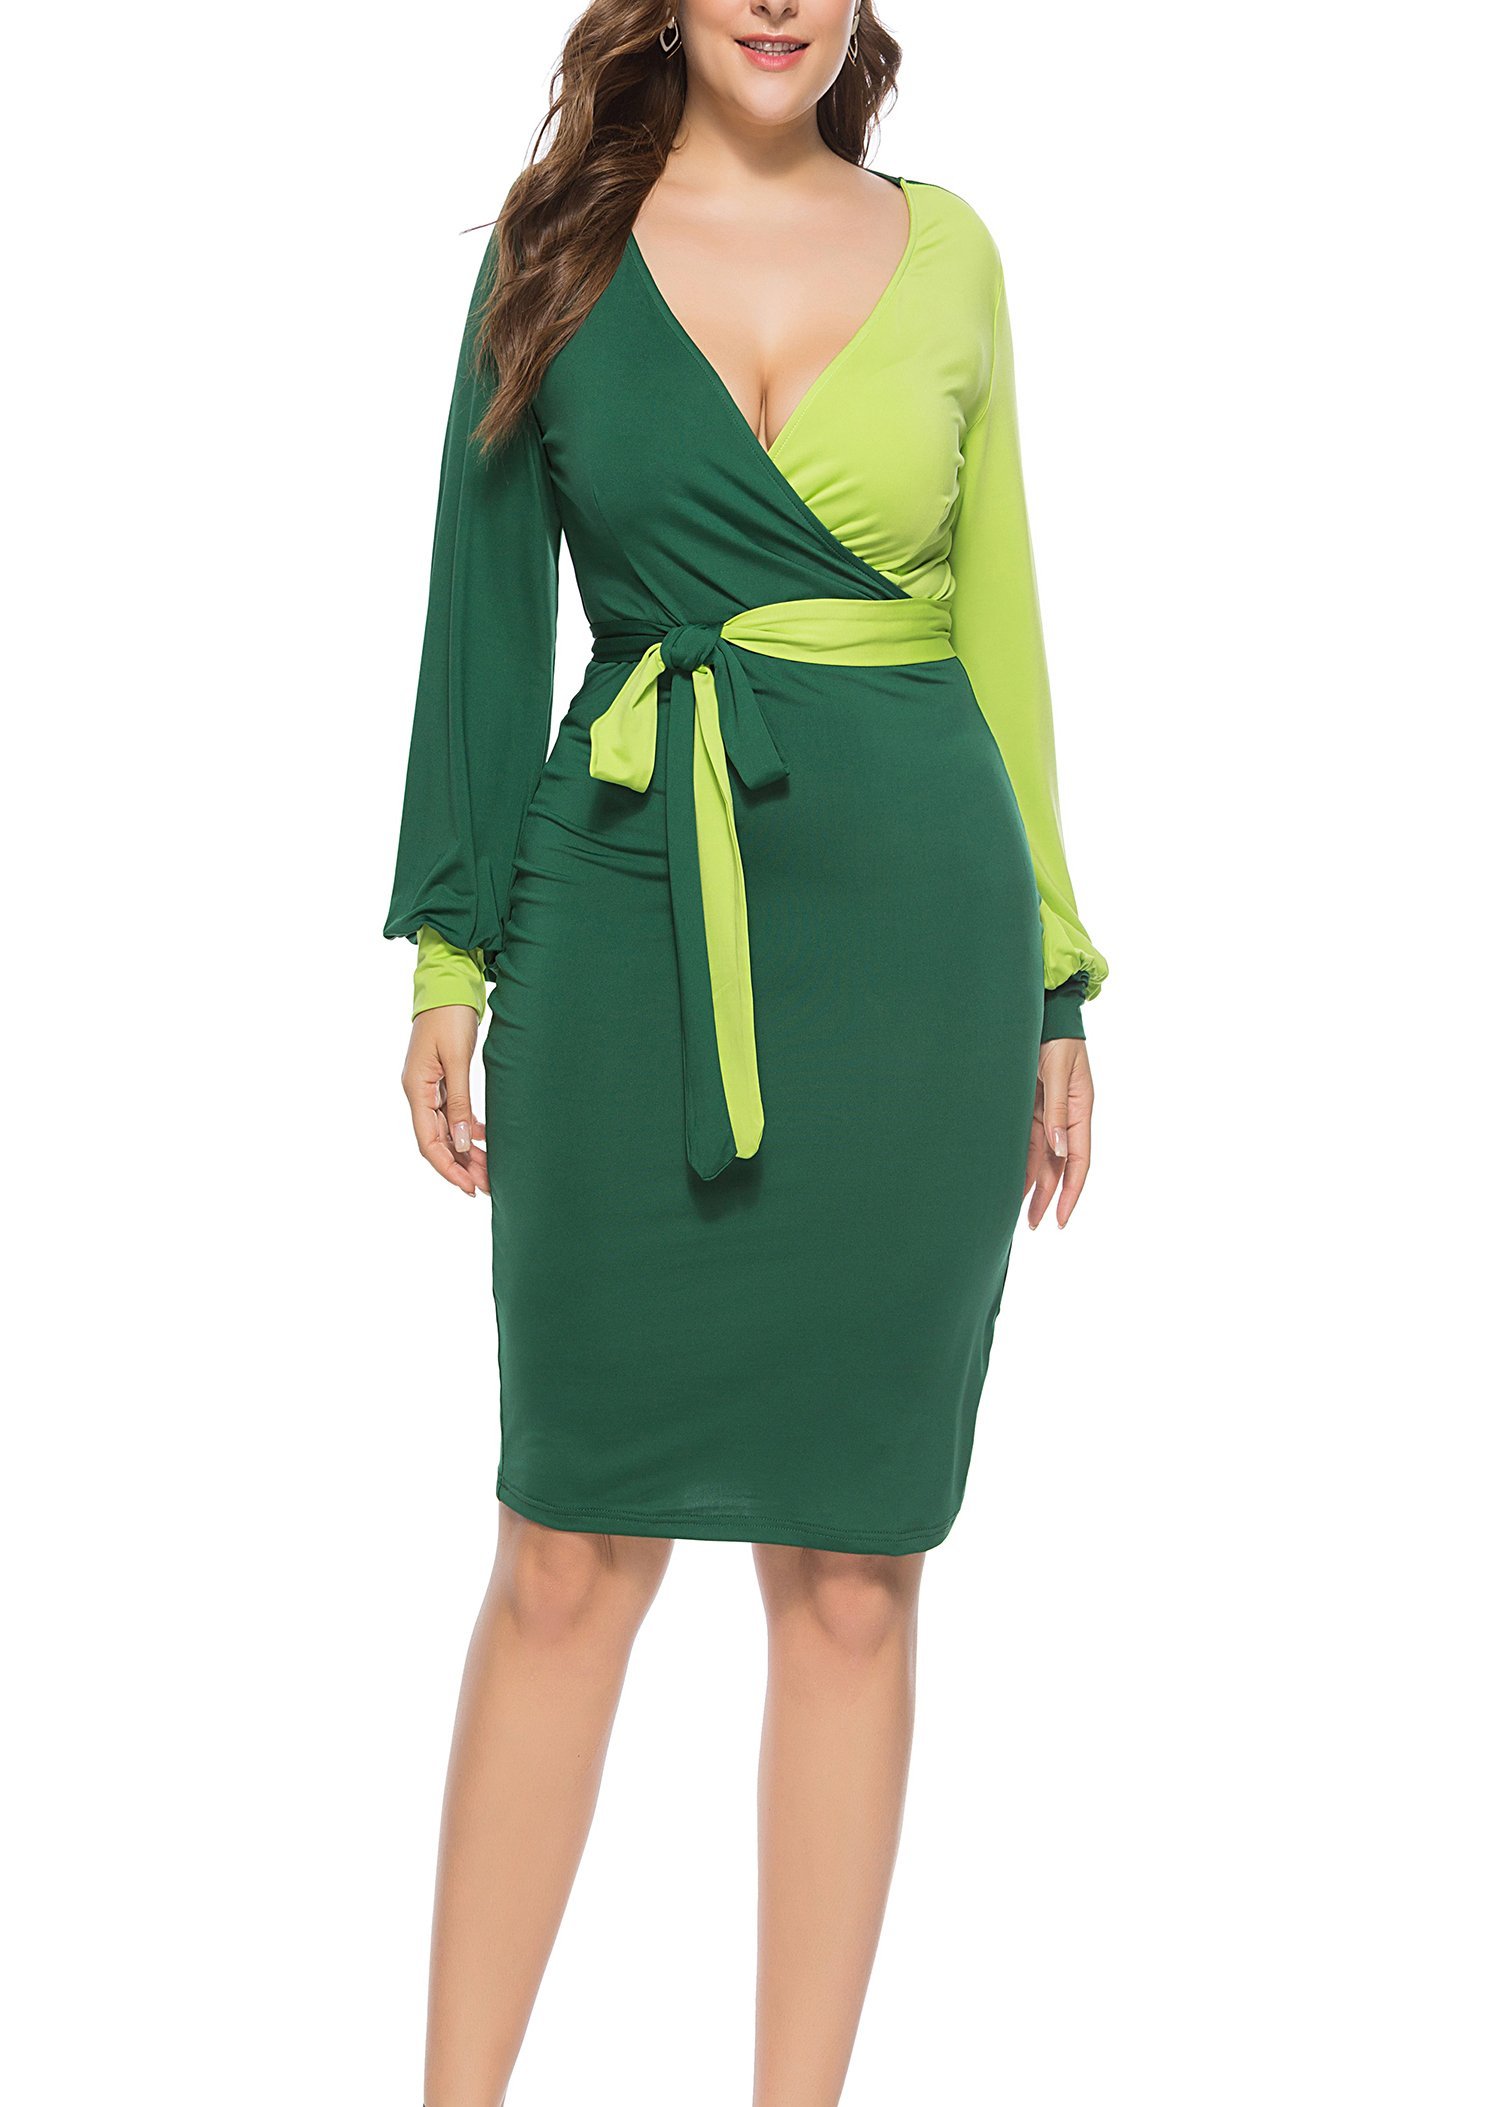 FACE N FACE Womens Sexy Deep V-Neck Midi Bodycon Dresses Long Sleeve Tie Front Colorblock Pencil Dress Mediun Light Green